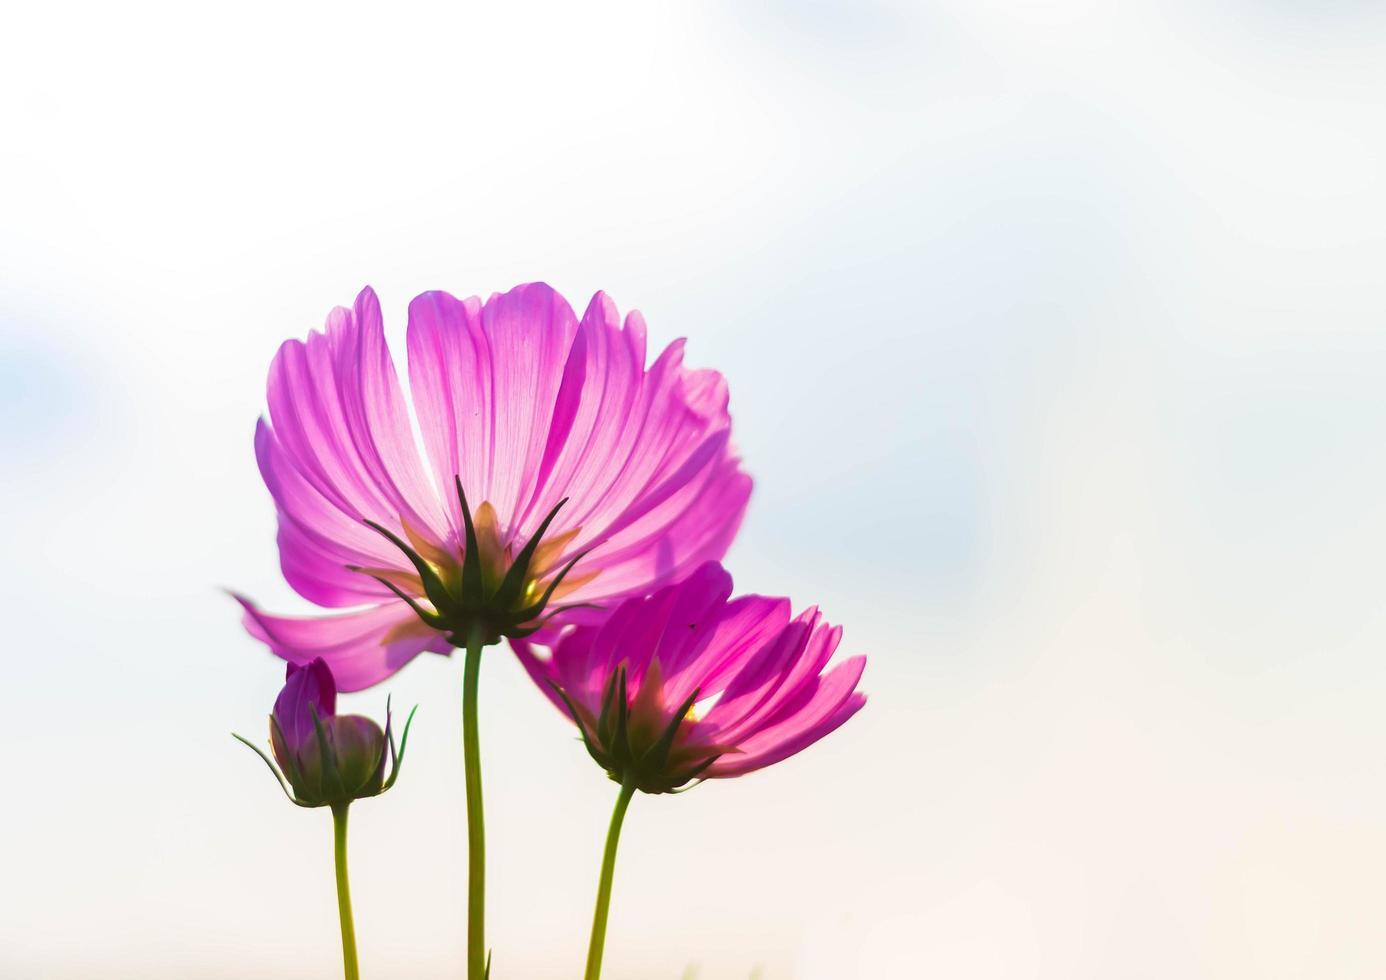 Pink cosmos flower in full bloom photo